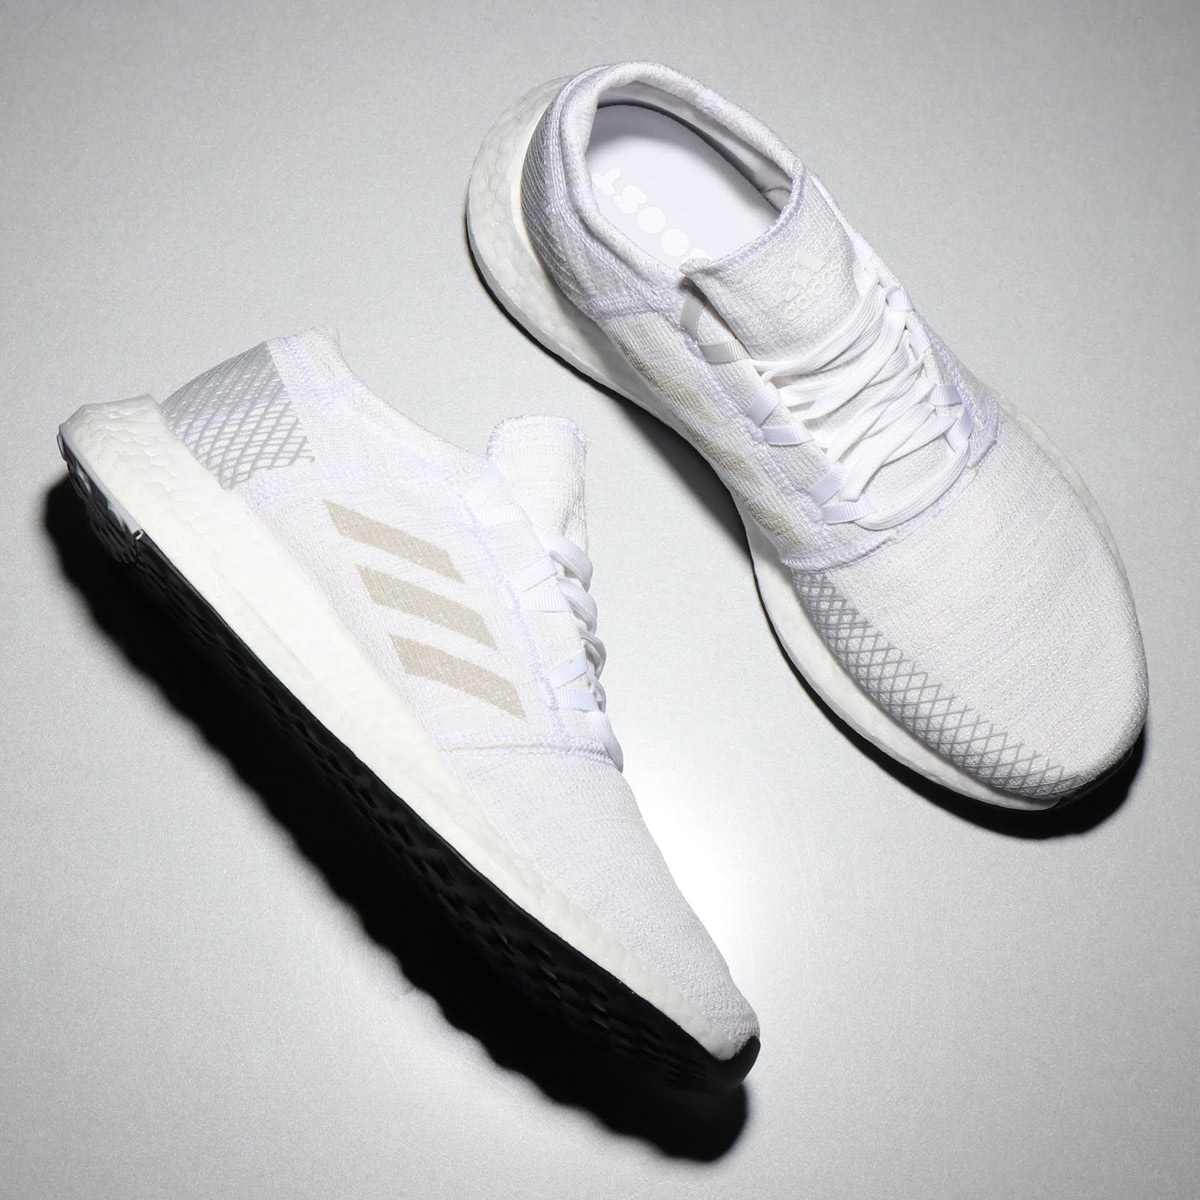 adidas PureBOOST GO(アディダス ピュアブーストGO)RUNNING WHITE/GREY【メンズ スニーカー】18FW-I